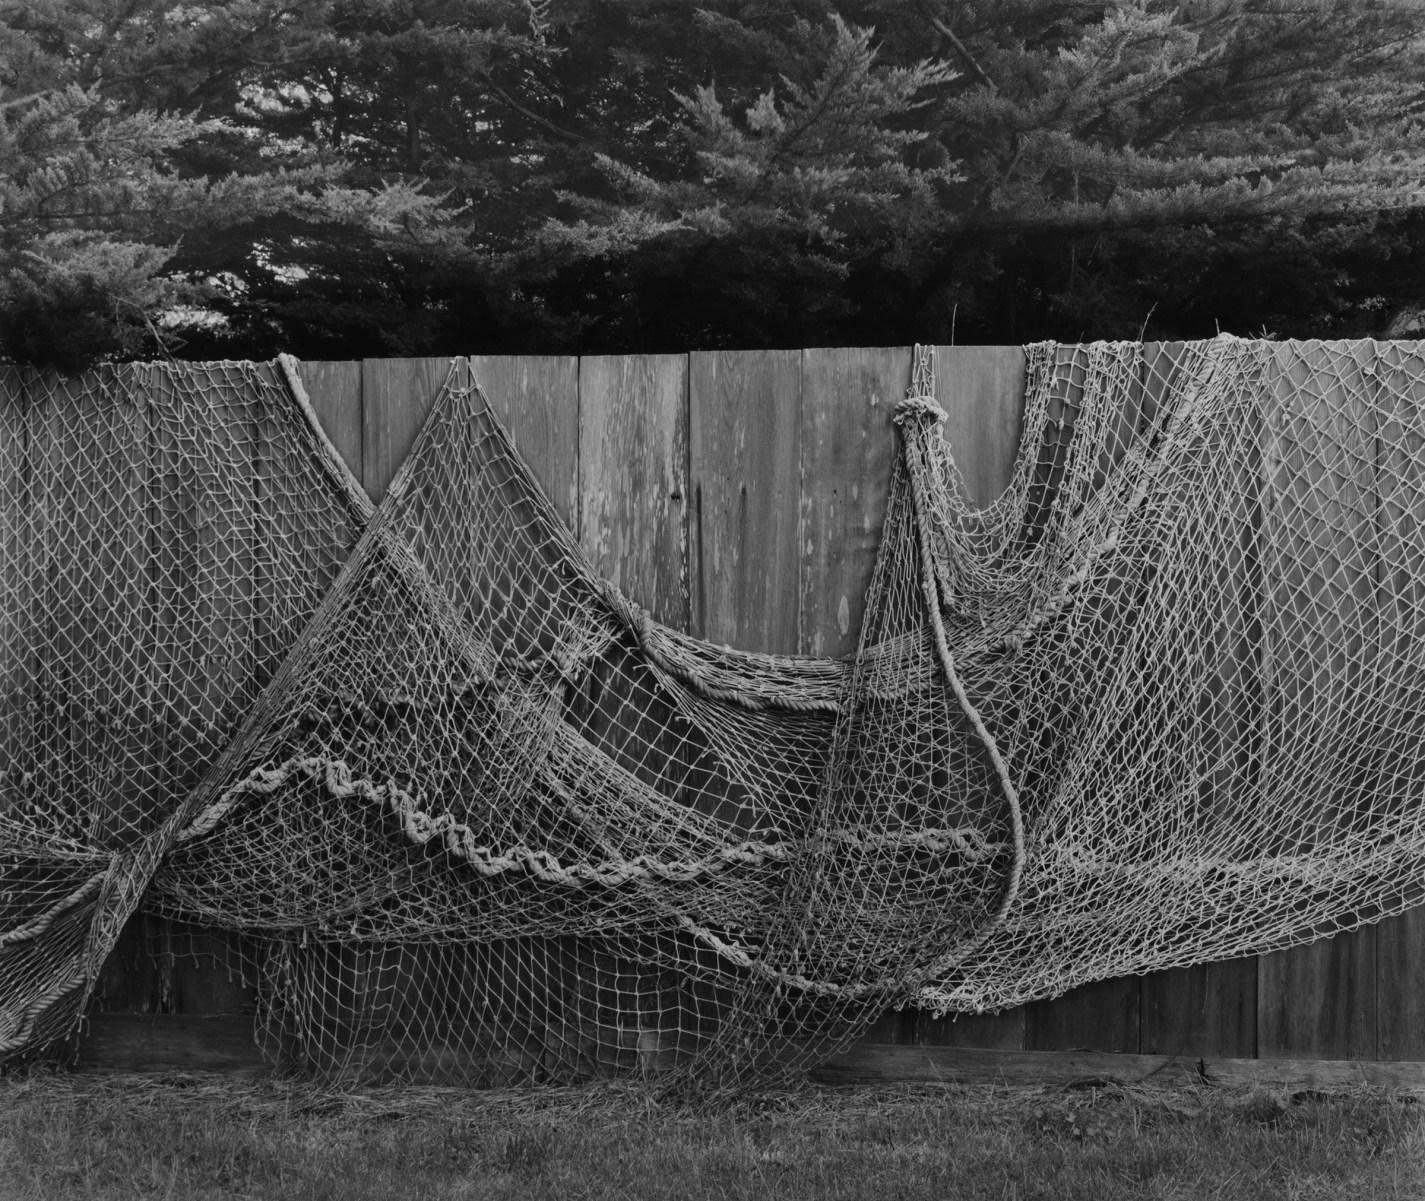 Fish Net over Fence, by Edna Bullock © Bullock Family Photography LLC